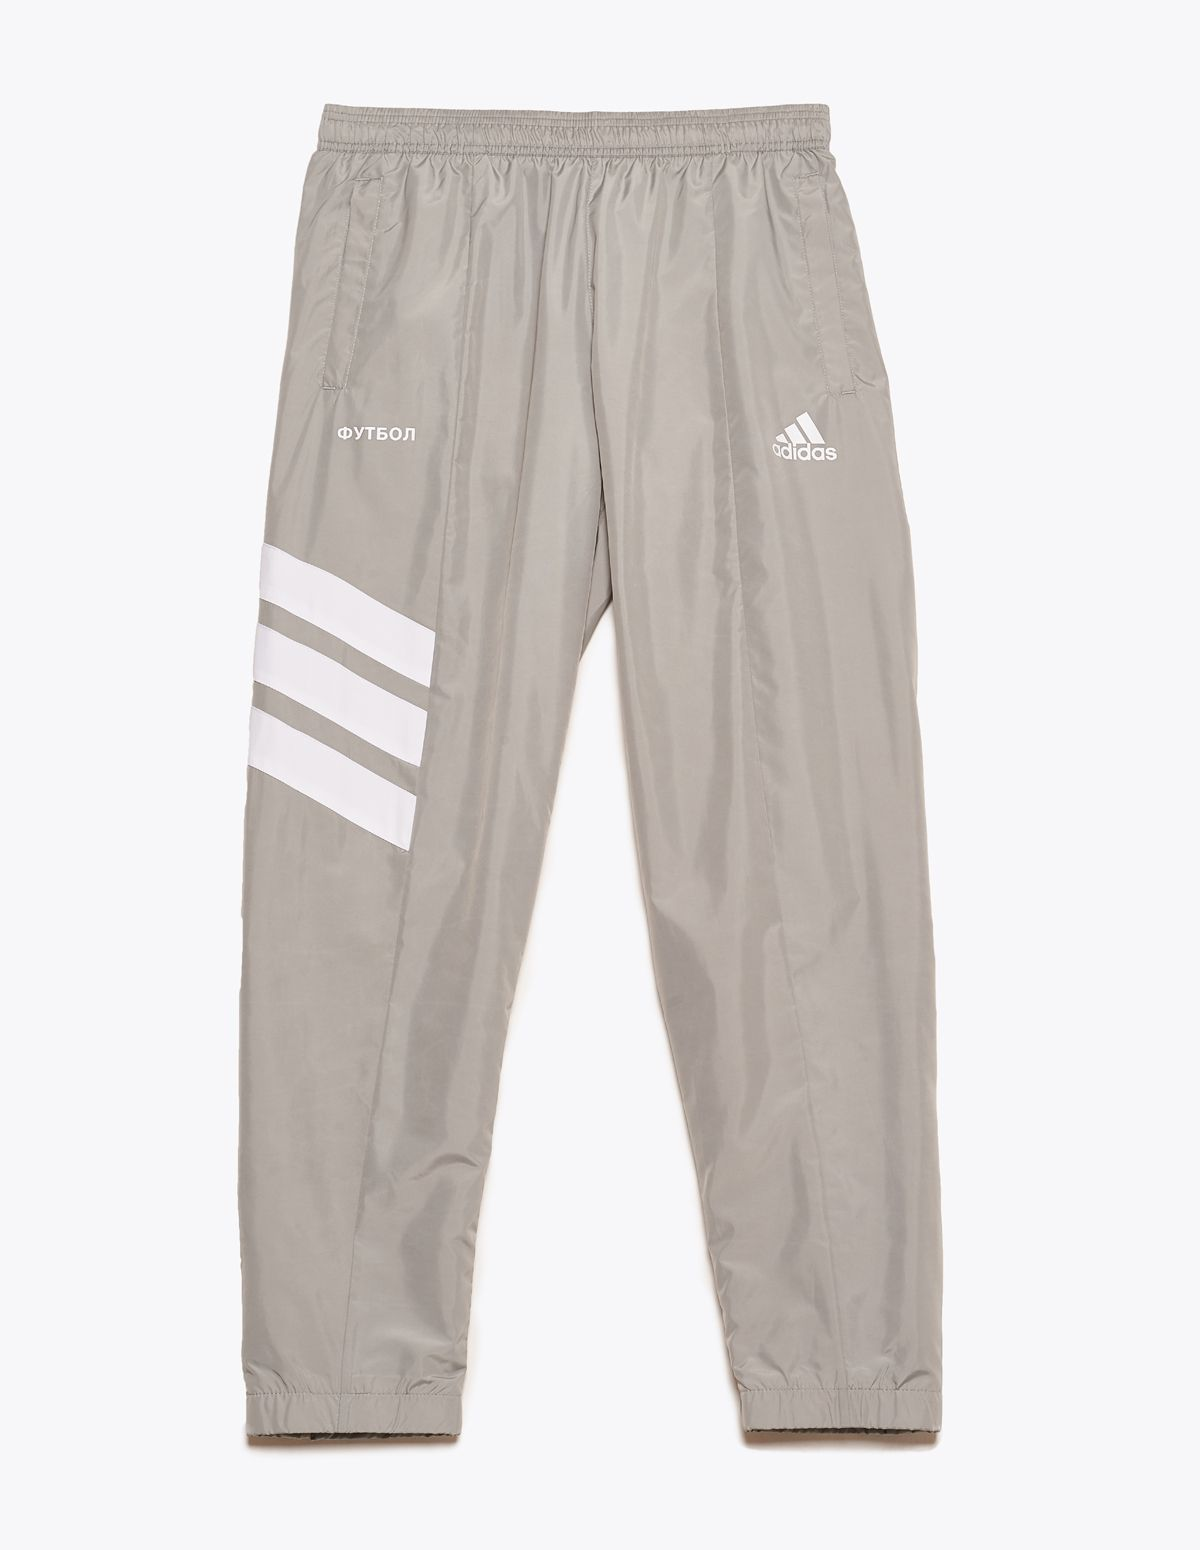 Gosha Rubchinskiy Adidas Track Pants Grey | TRÈS BIEN